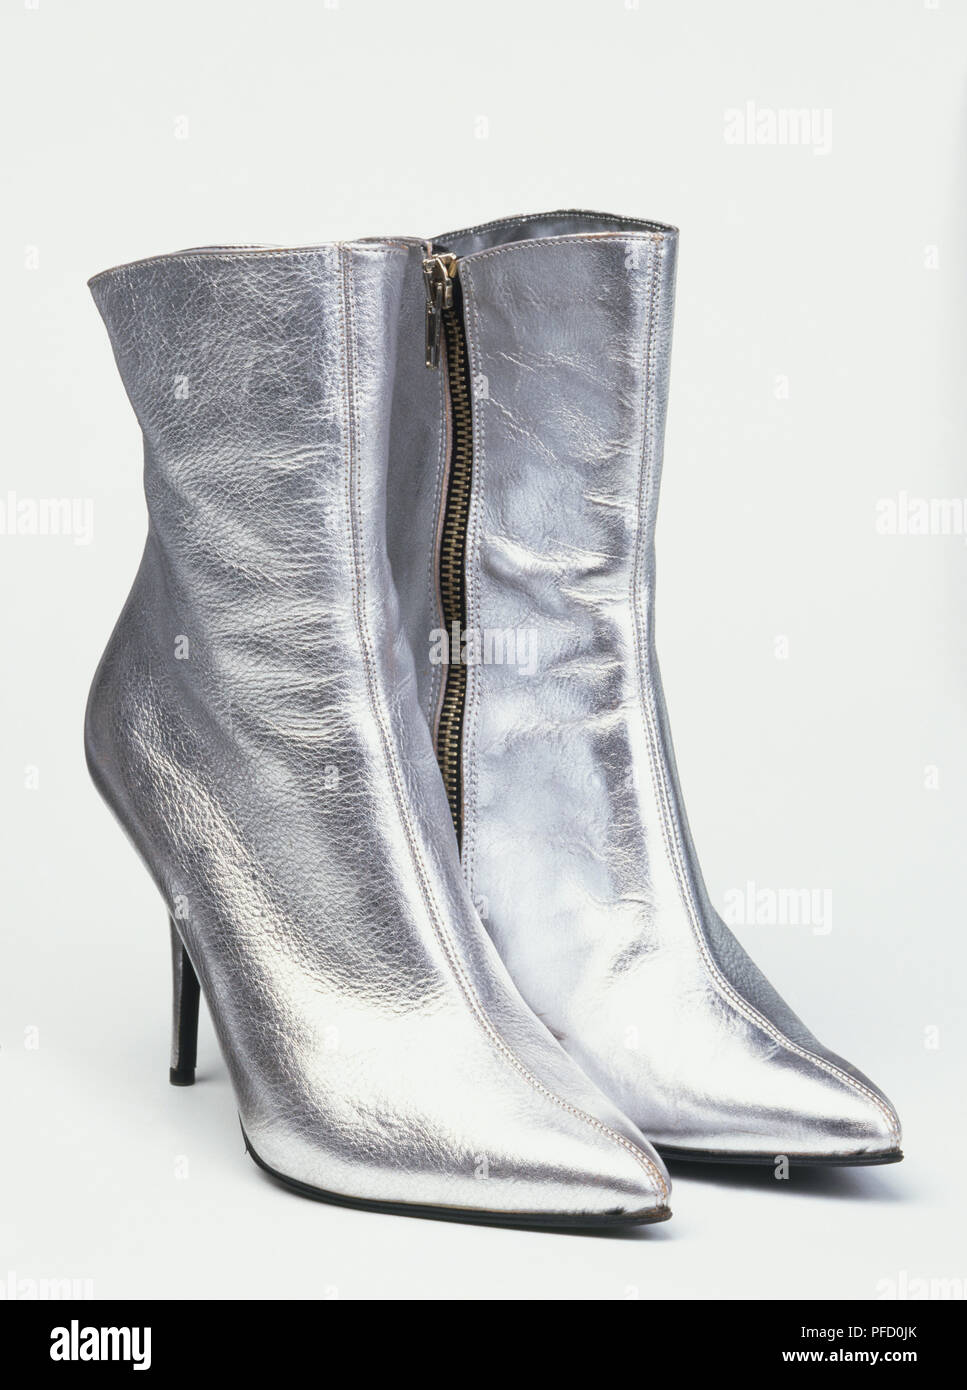 new york 40fe8 bae16 Silberne Stiefel Stockfotos & Silberne Stiefel Bilder - Alamy